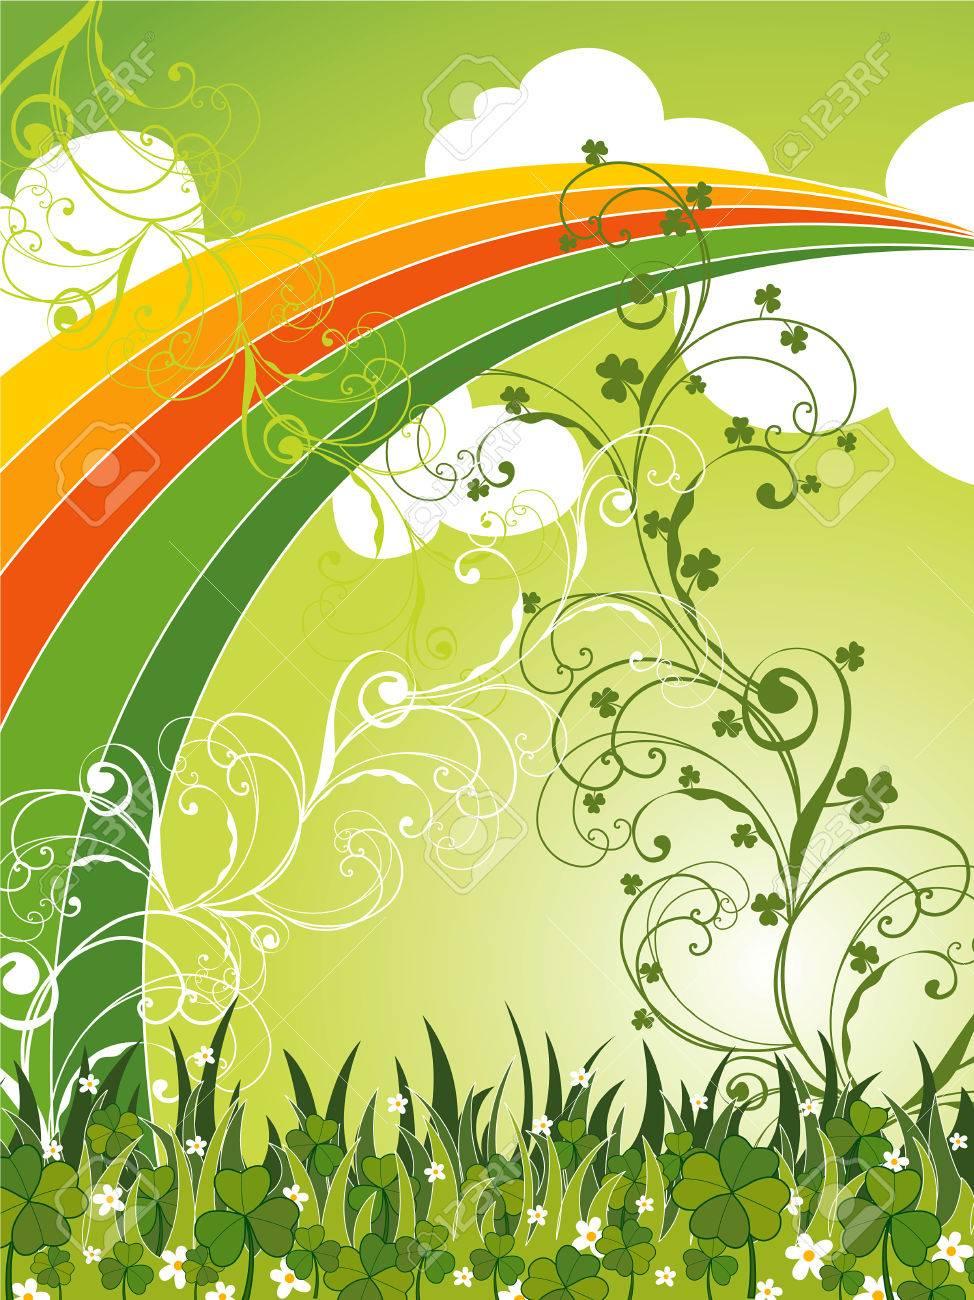 saint patrick field of clovers and rainbow (vector) Stock Vector - 2646268